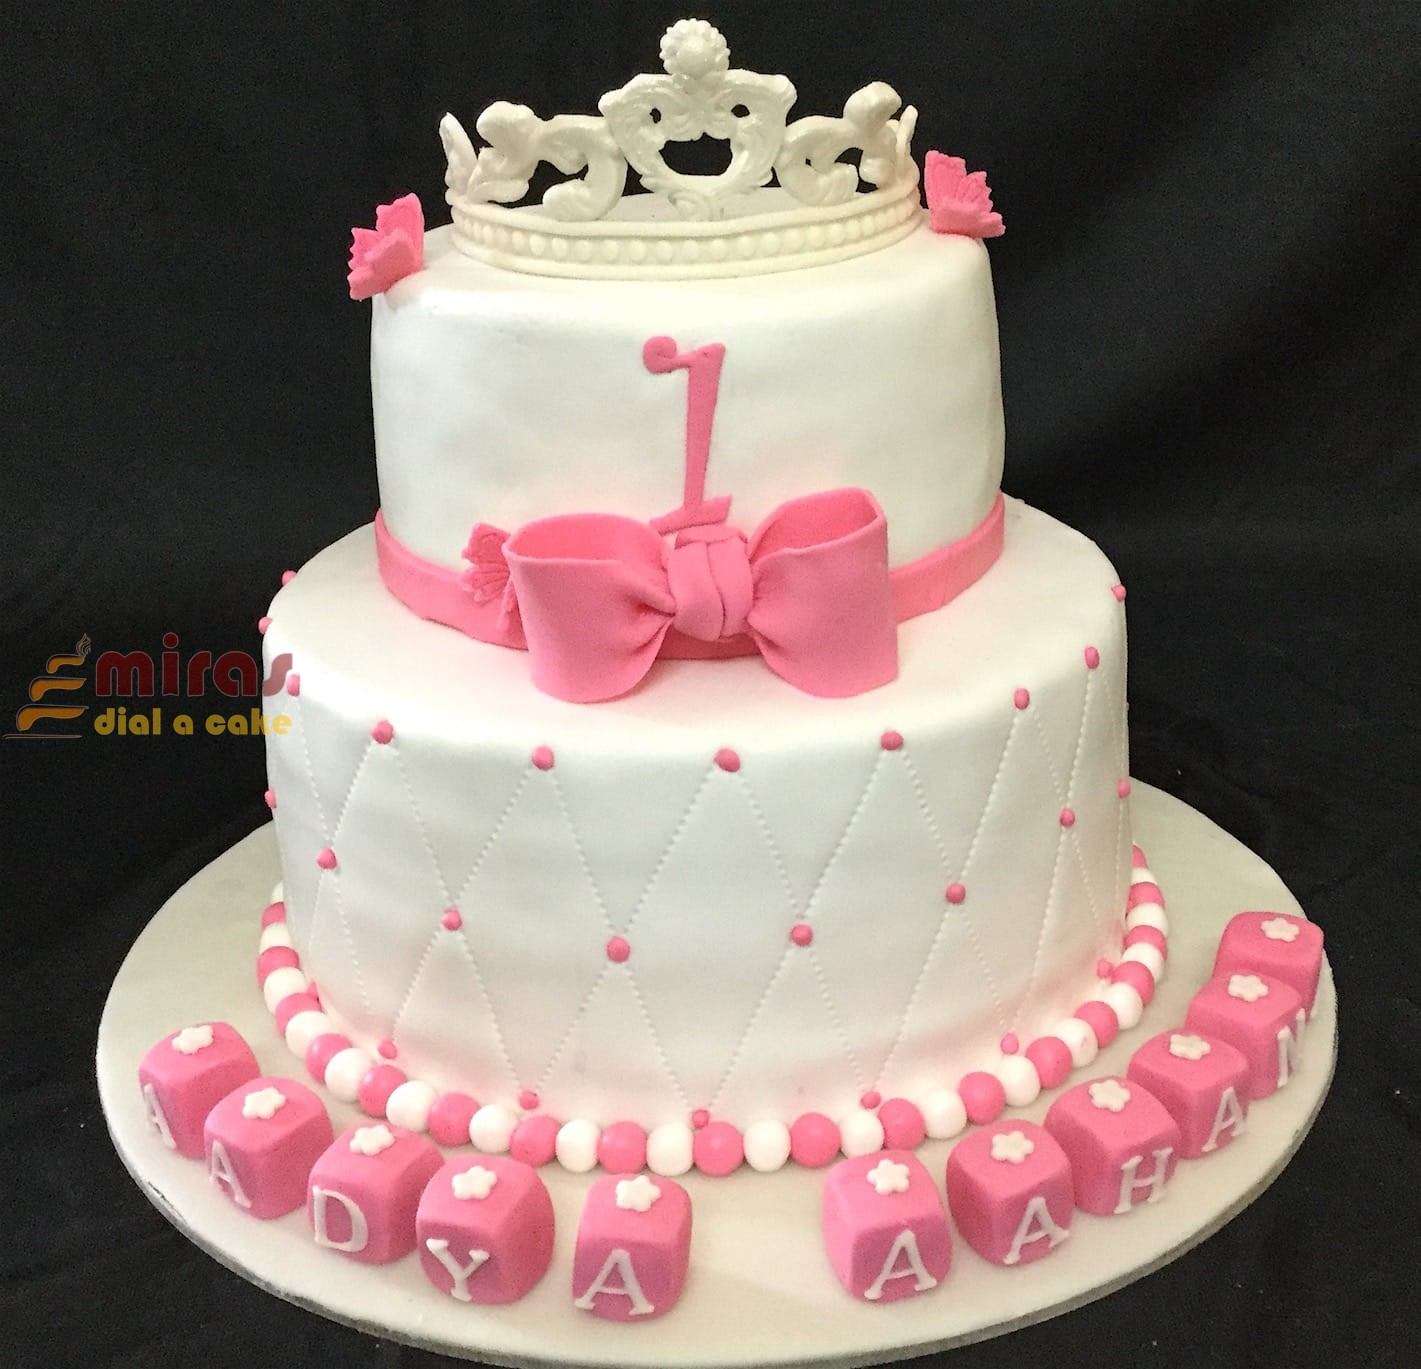 Kg Near Me >> Customized 1st Birthday Tiara Cake